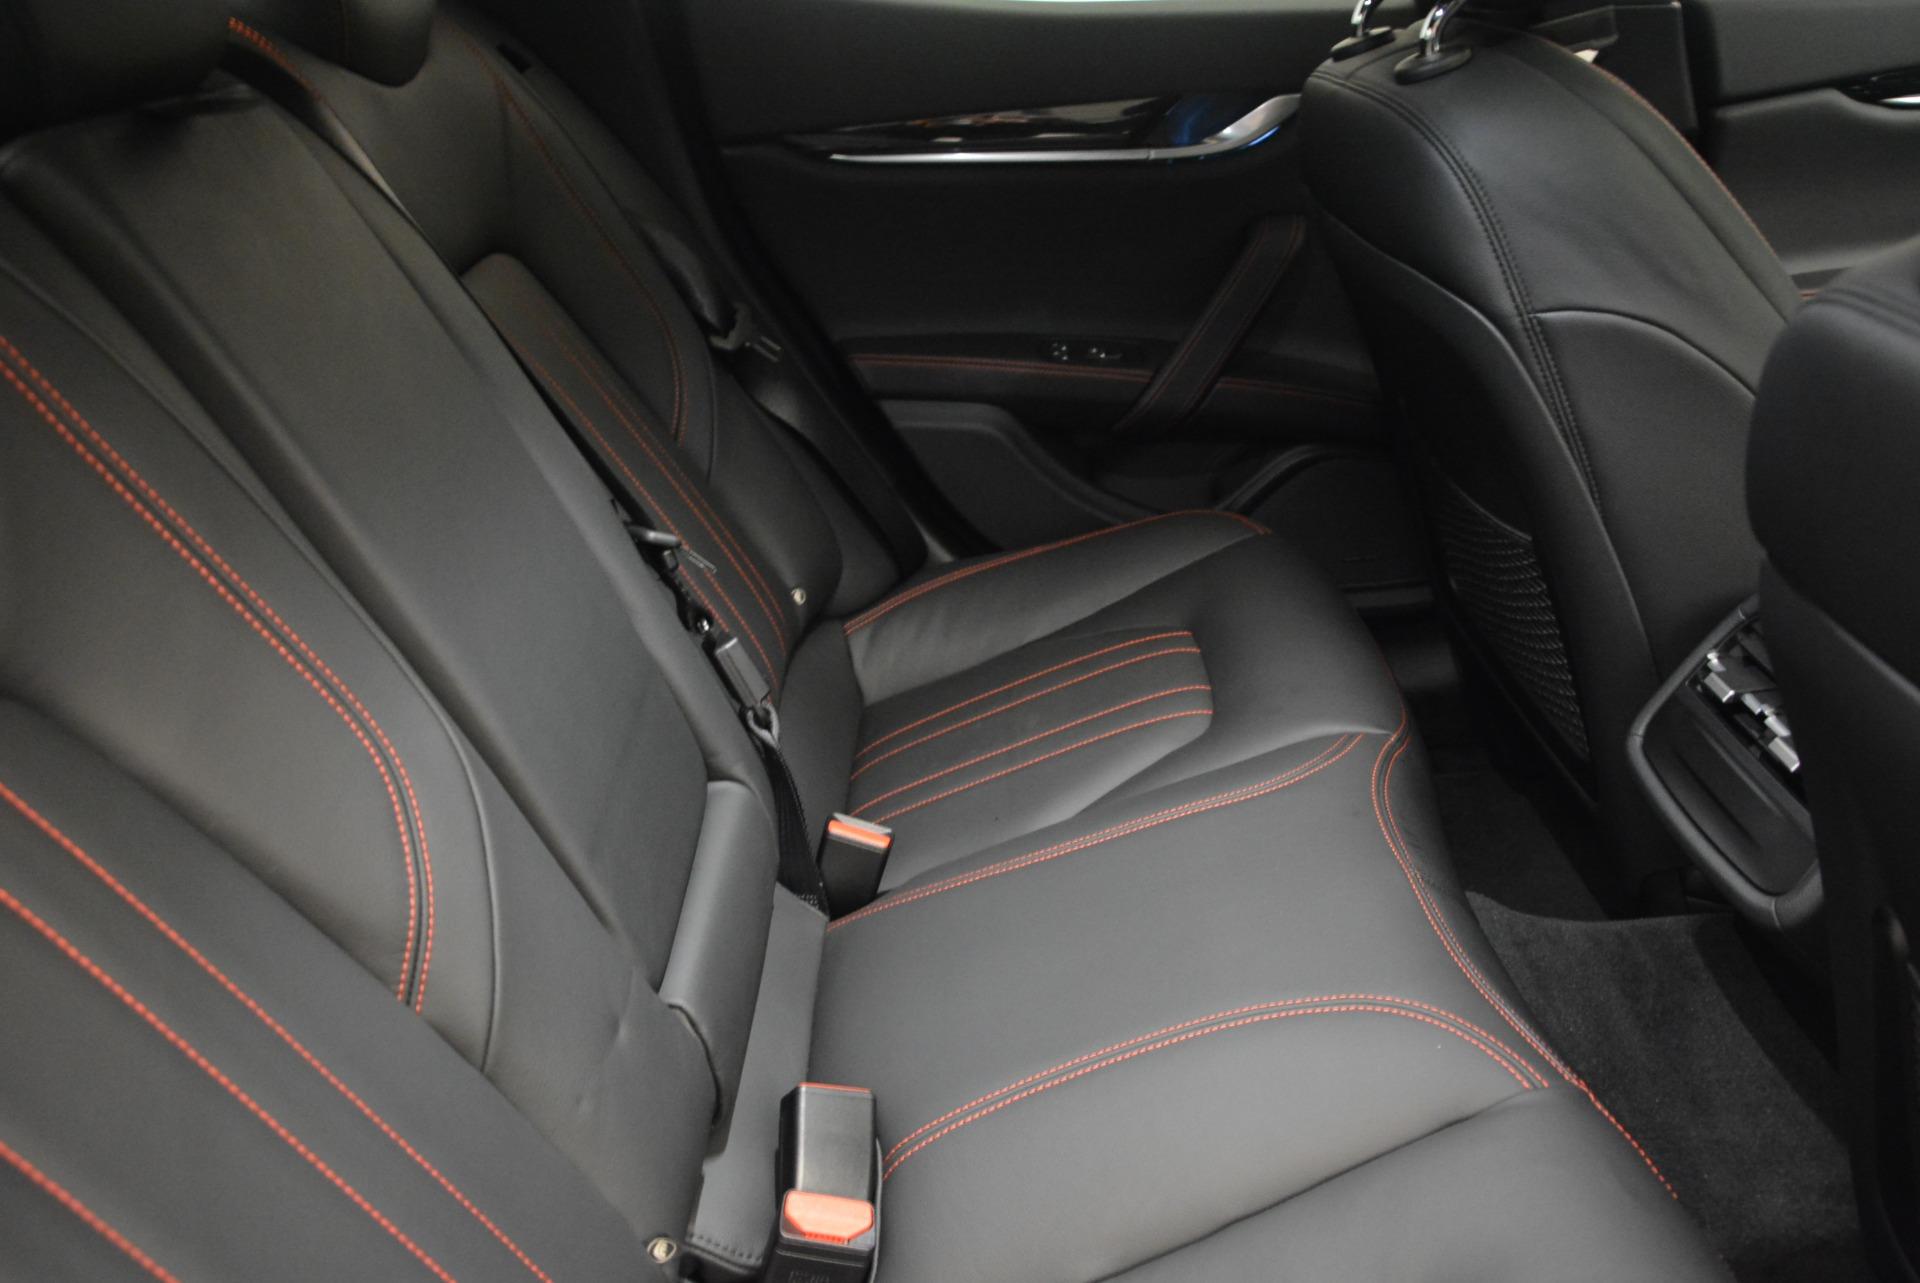 Used 2017 Maserati Ghibli S Q4 - EX Loaner For Sale In Greenwich, CT 576_p24